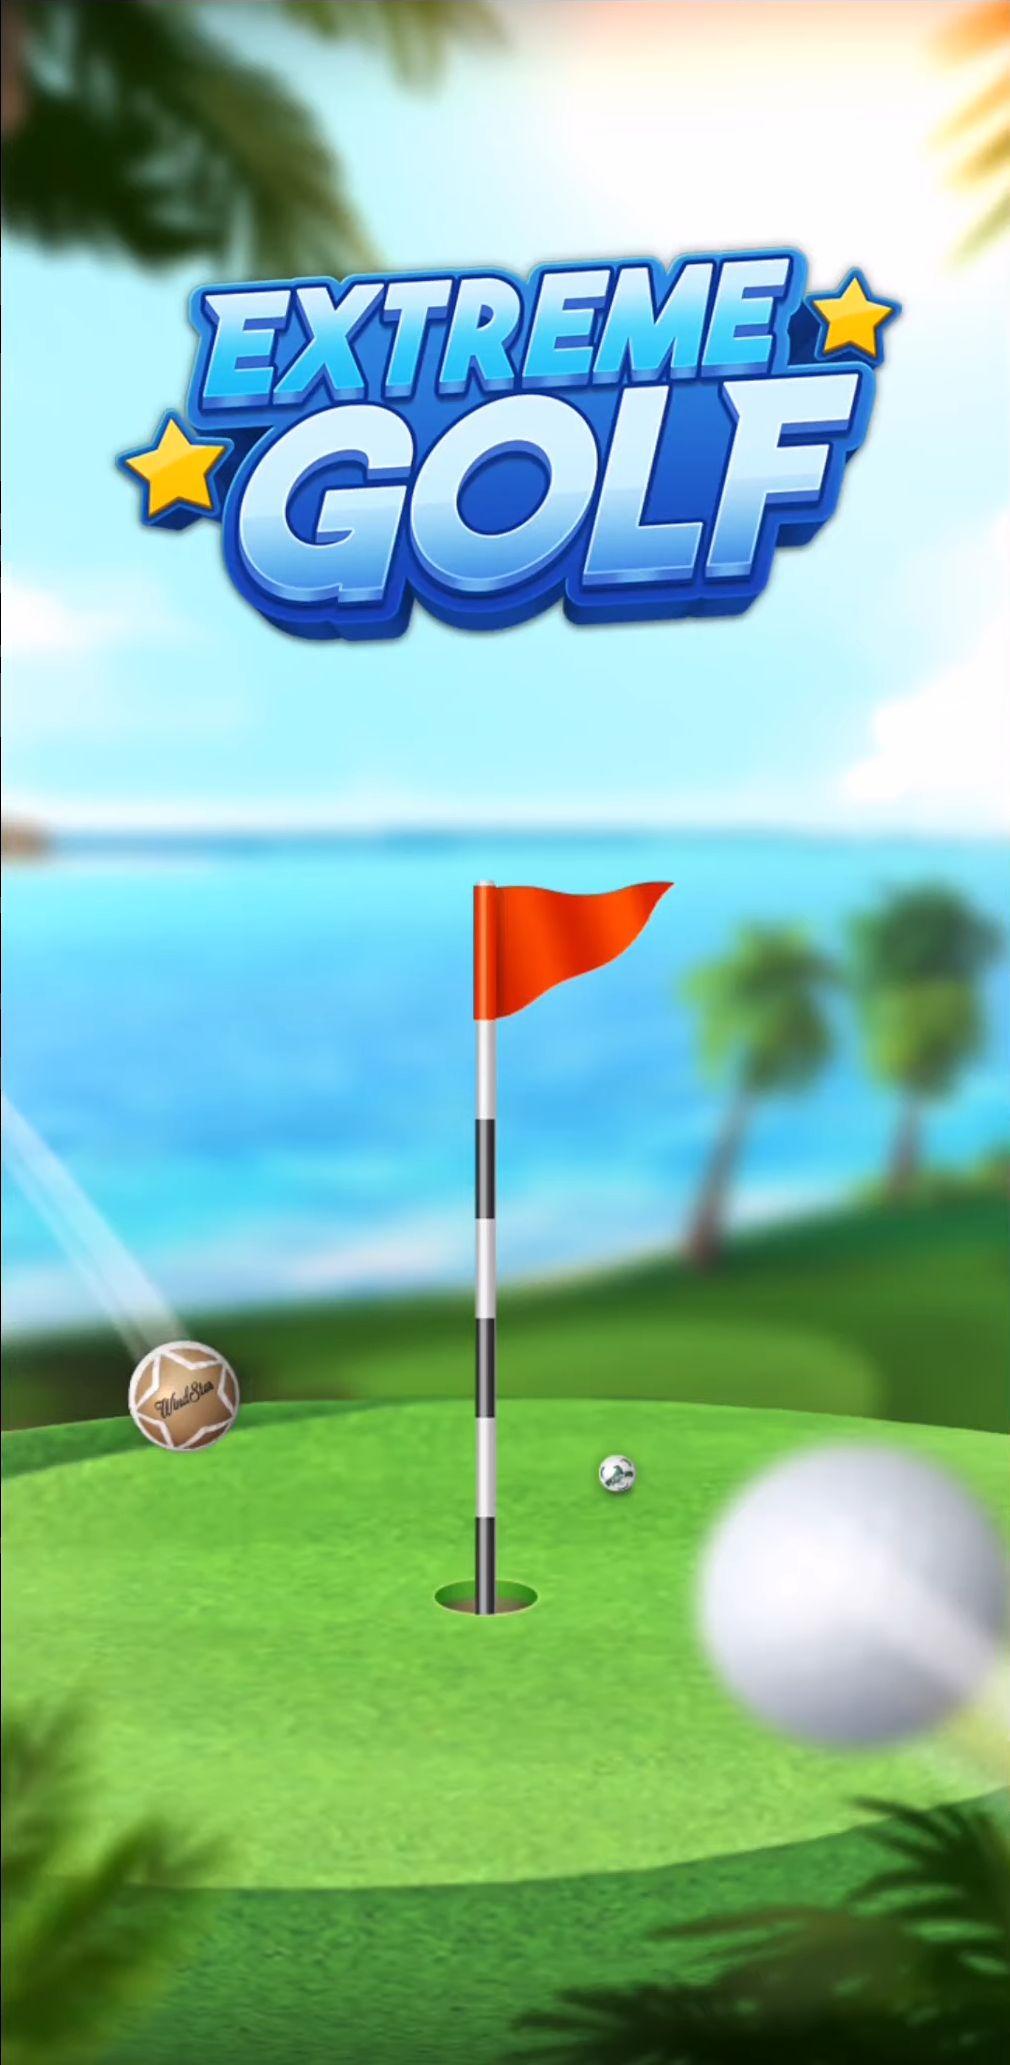 Extreme Golf - 4 Player Battle captura de tela 1